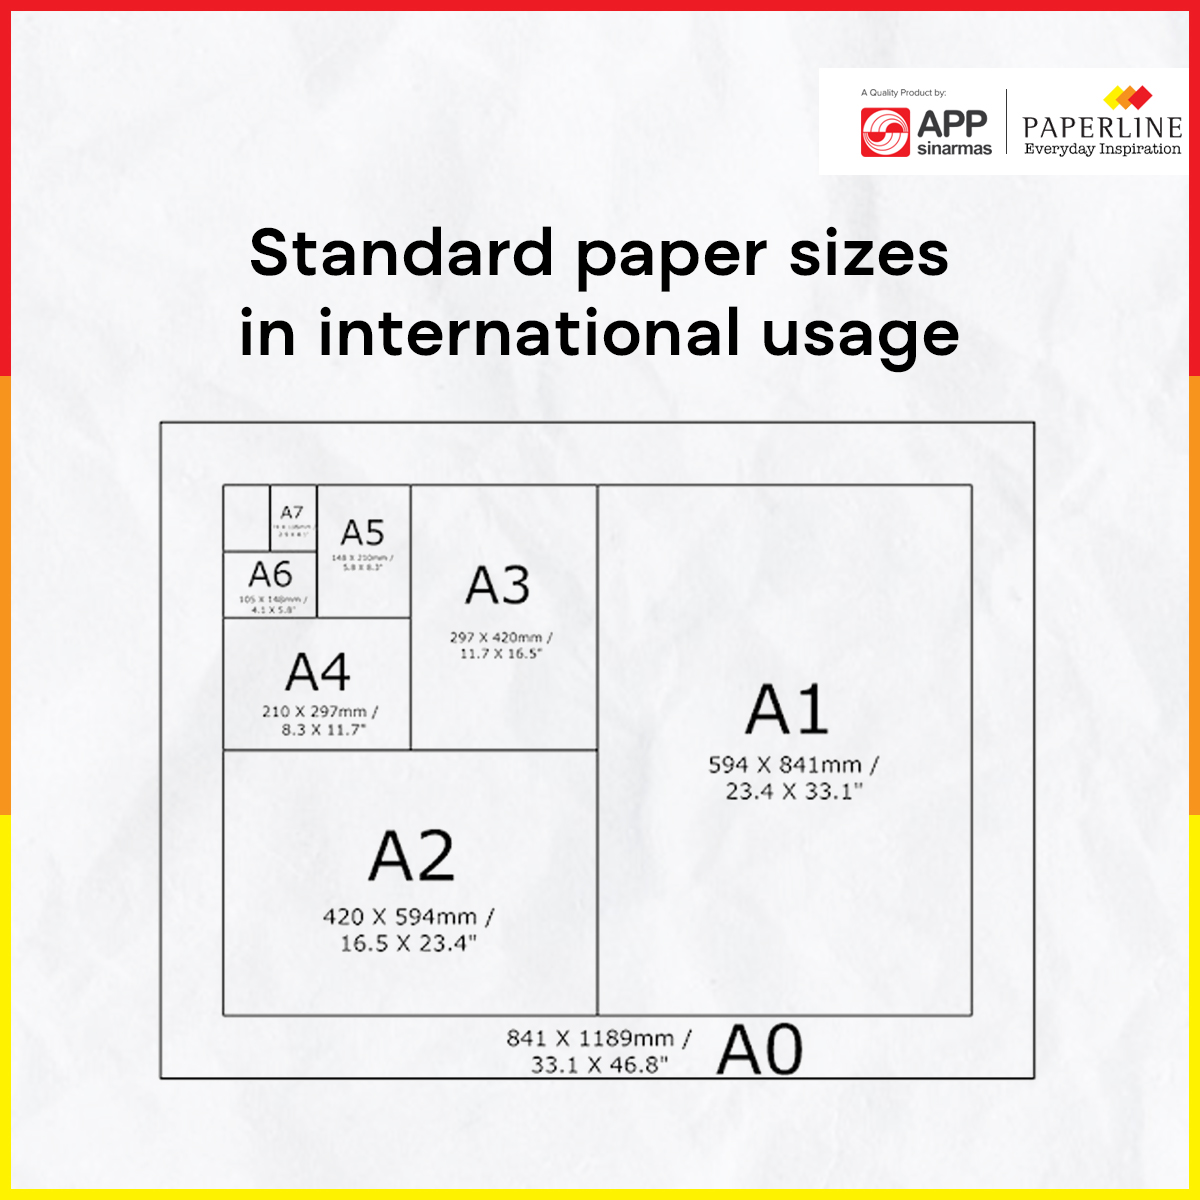 Standard Paper Sizes in International Usage